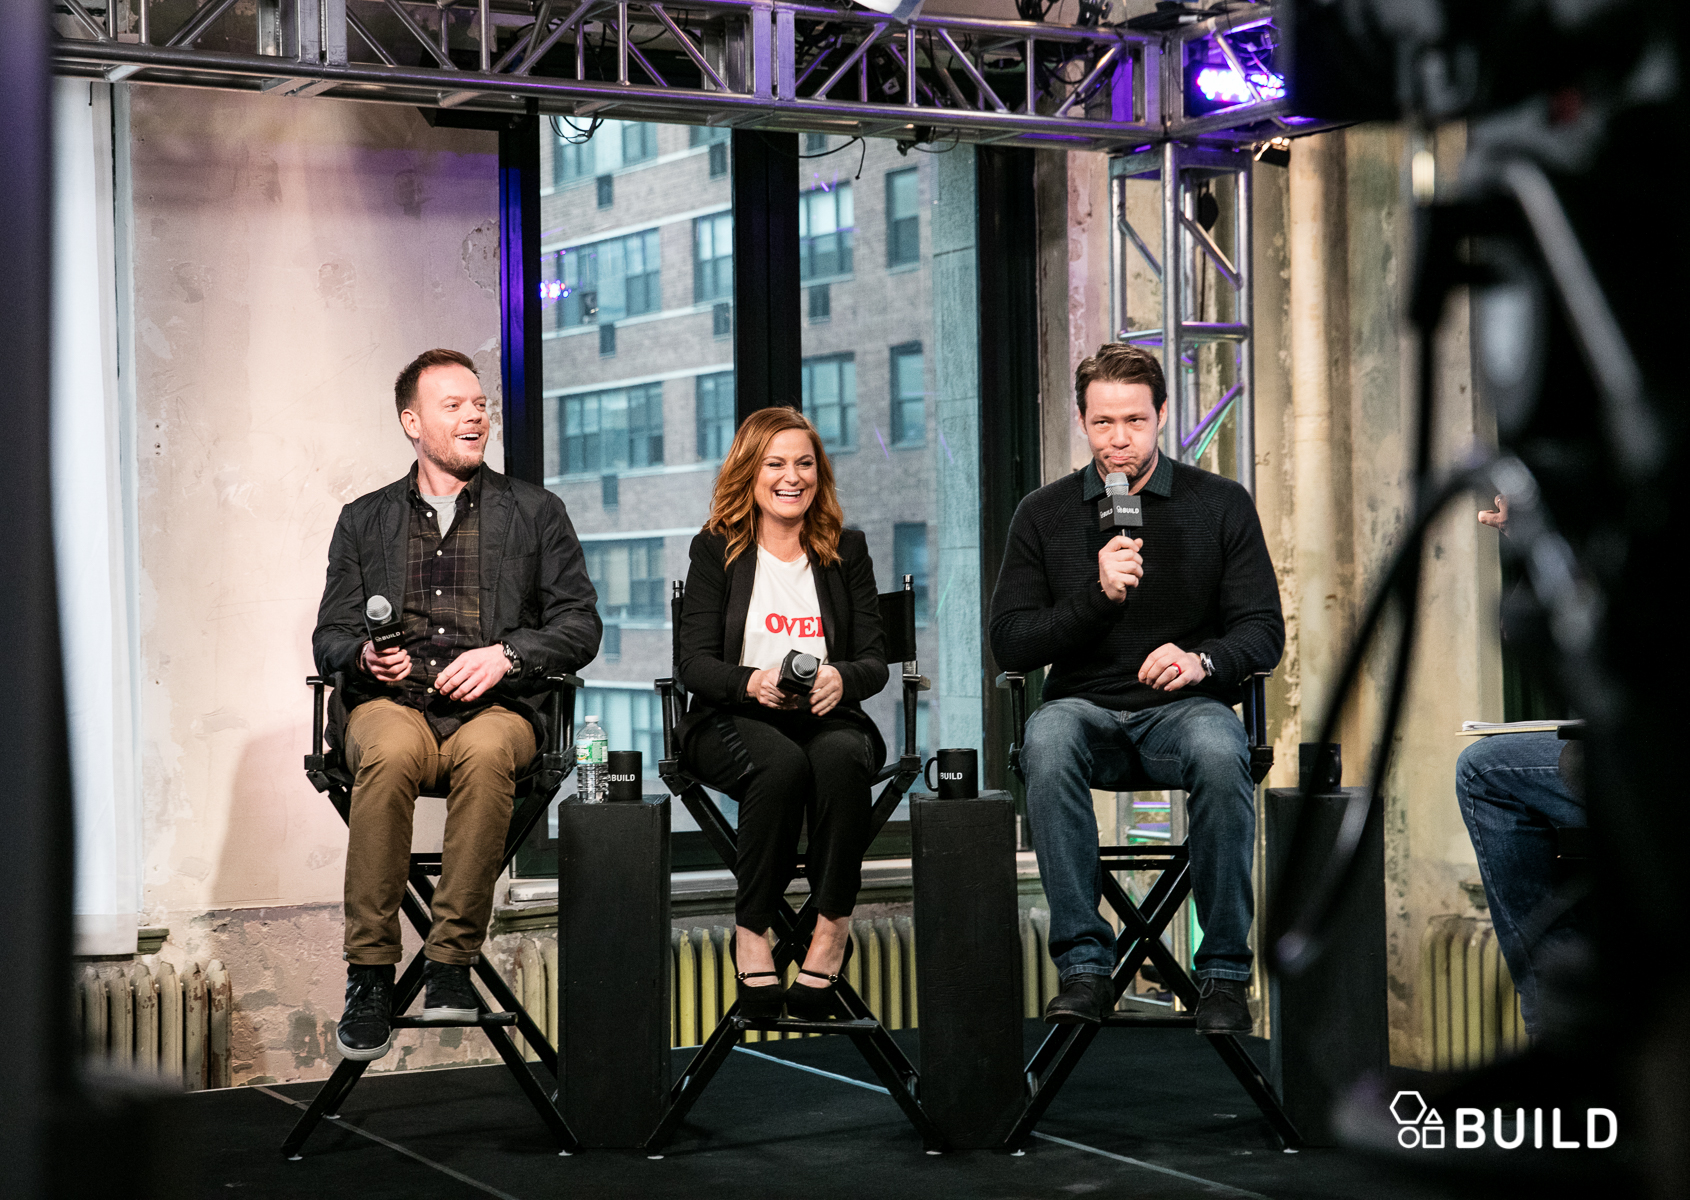 Onlyonaol Amy Poehler Ike Barinholtz And Jason Moore Share A Bond